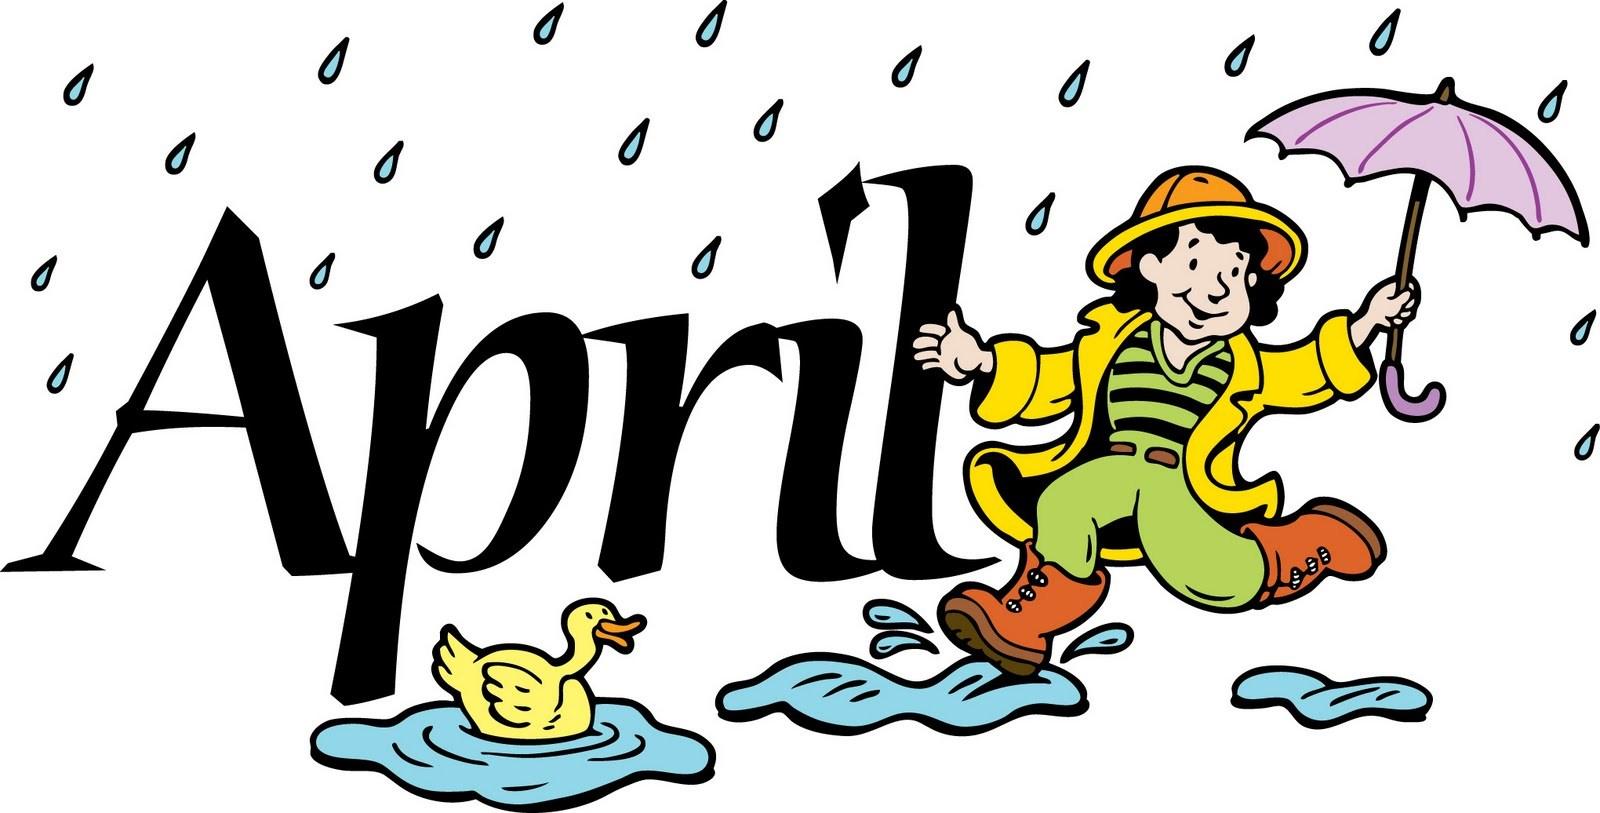 April calendar headings clipart clip free April calendar headings clipart - ClipartFest clip free